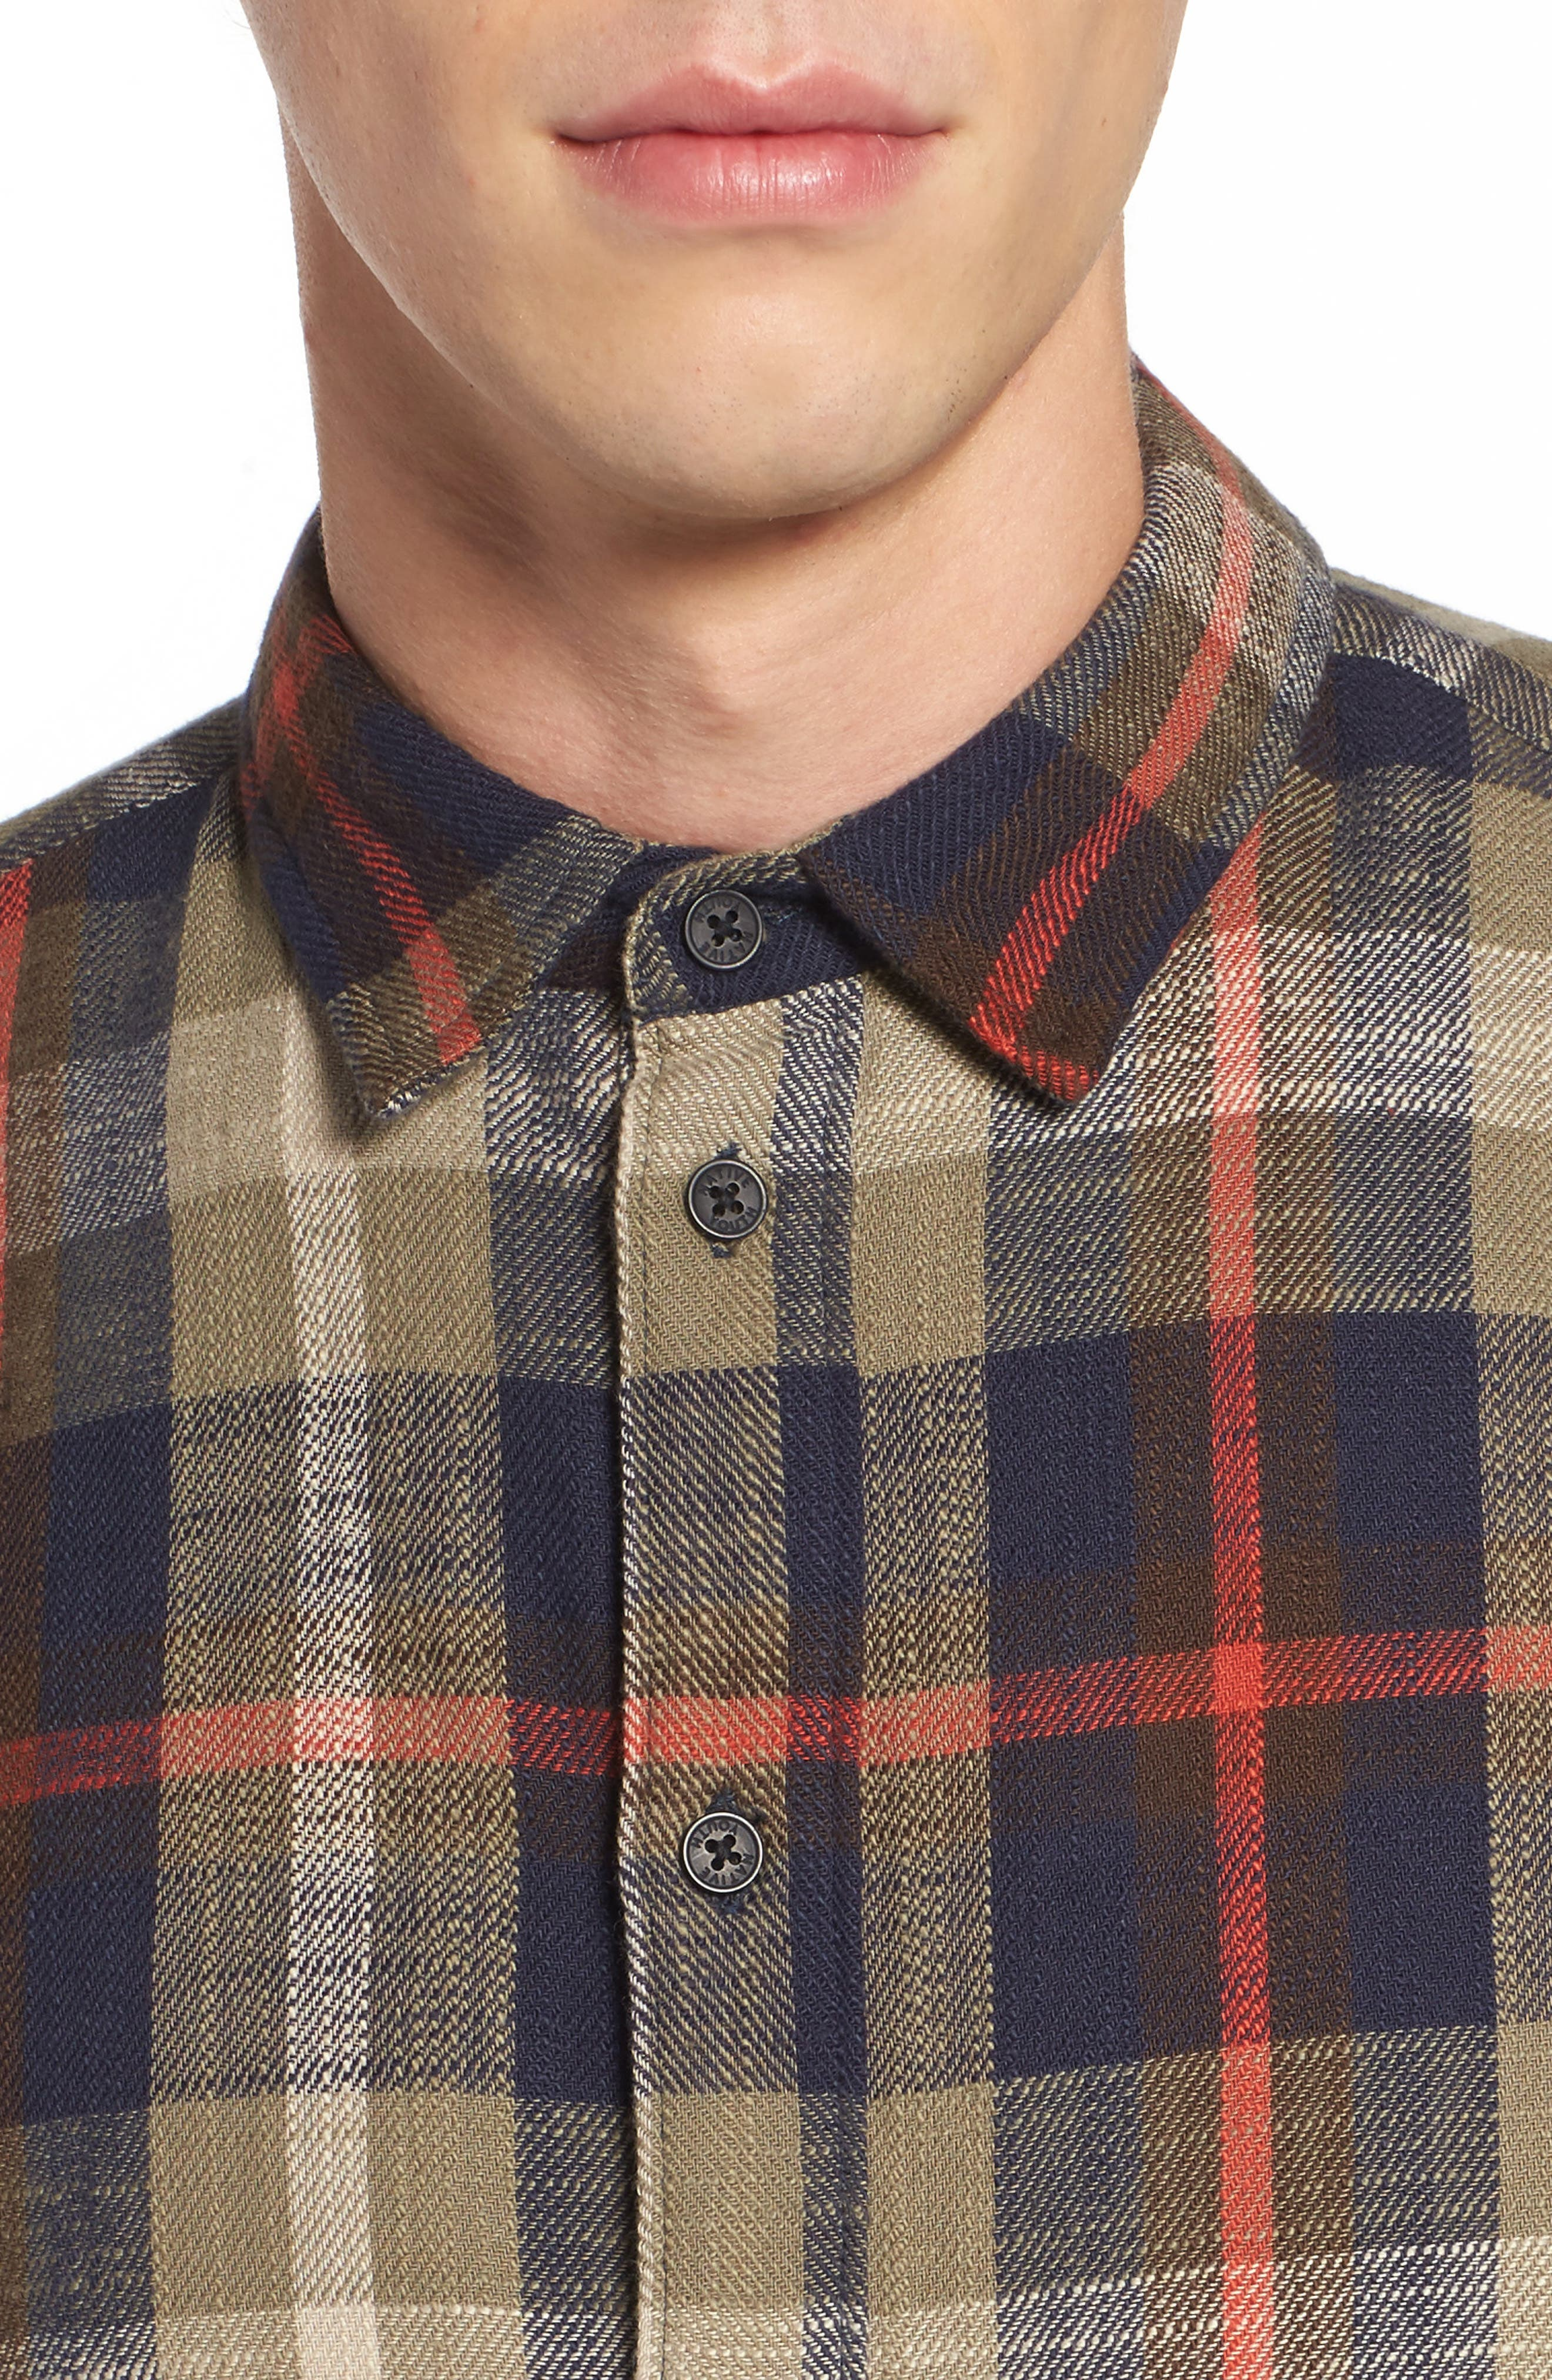 Brae Plaid Flannel Shirt,                             Alternate thumbnail 4, color,